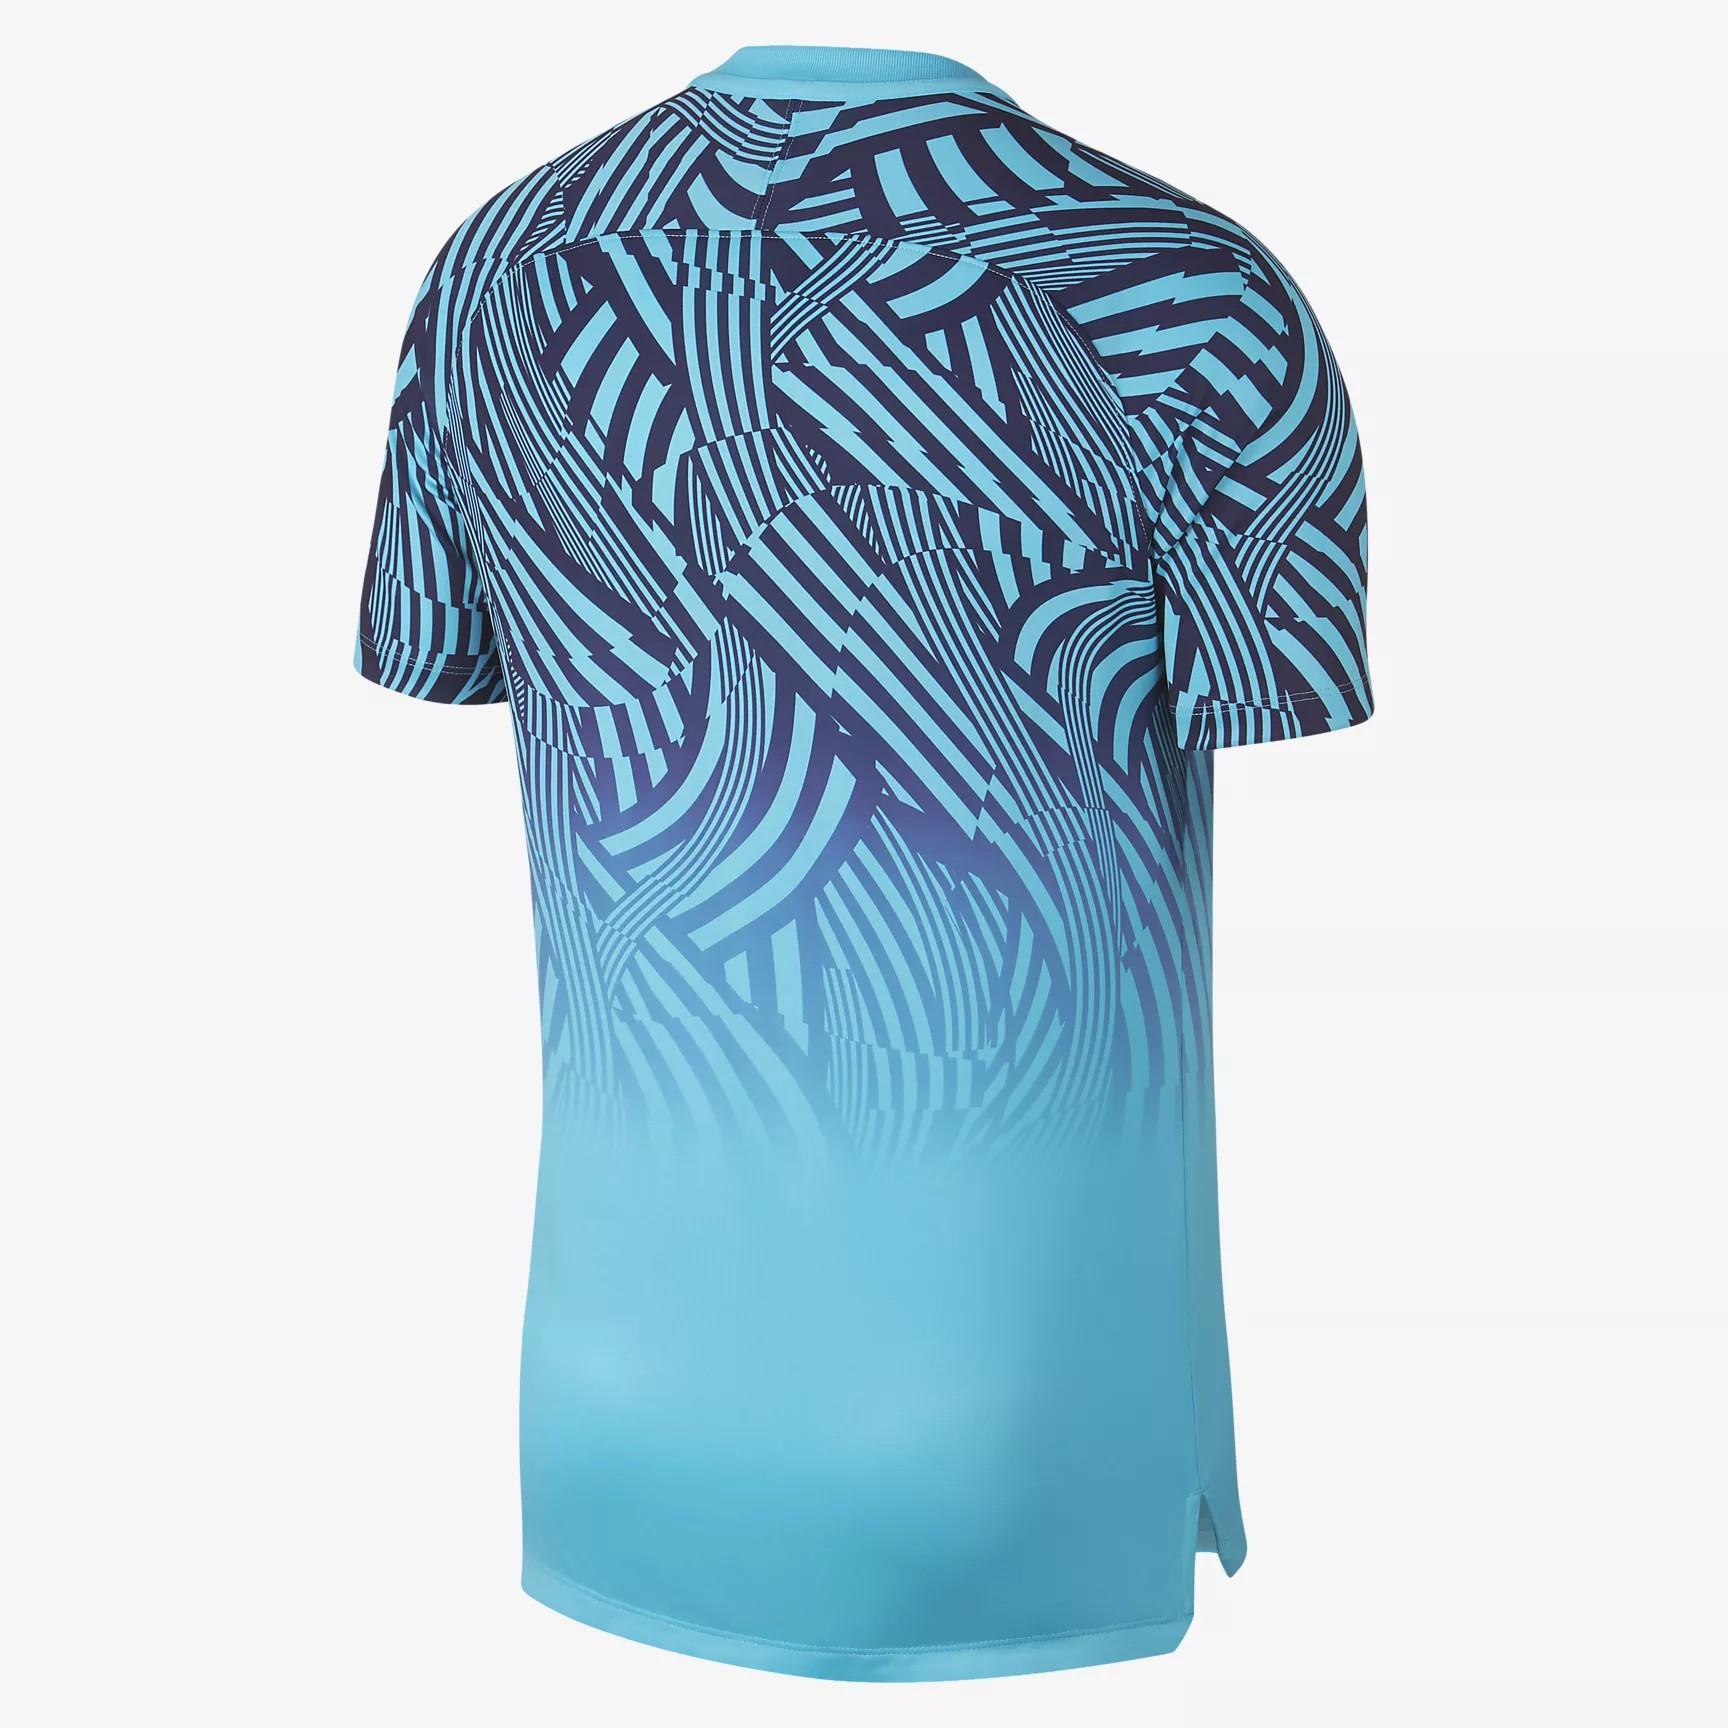 Nike Tottenham Hotspur Dri Fit Squad Football Top Polarised Blue Binary Blue White Equipment Football Shirt Blog